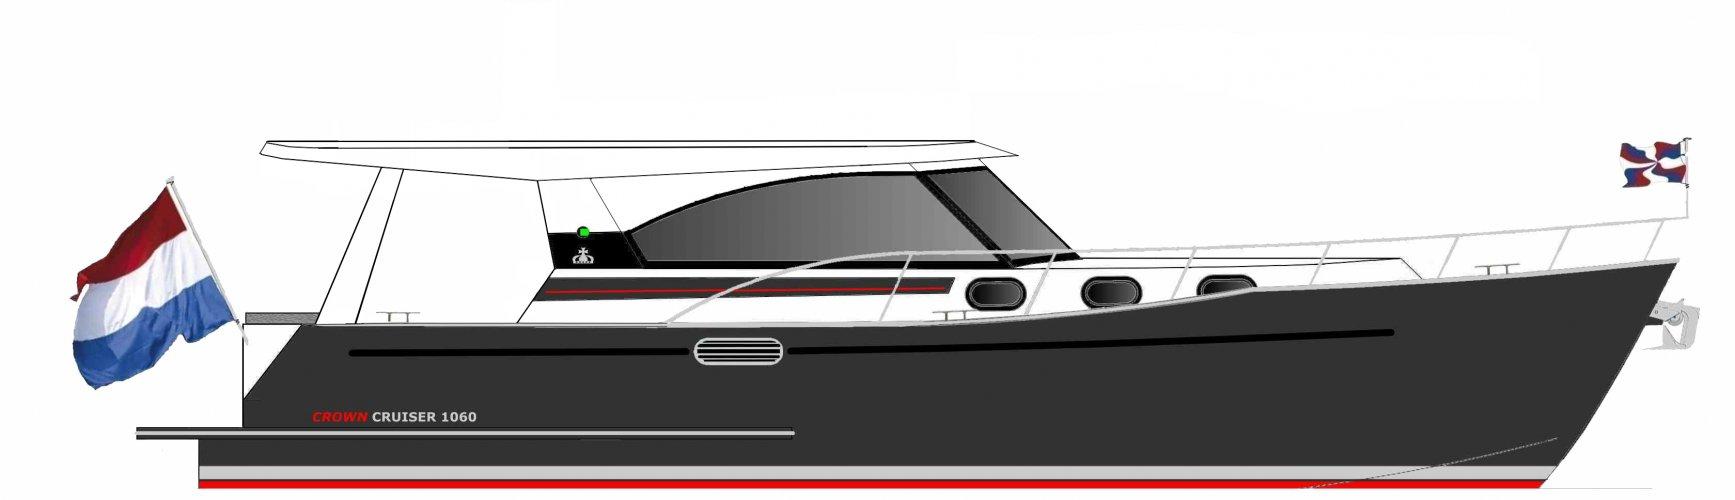 Nieuwbouw Crown Cruiser X.5 foto: 0